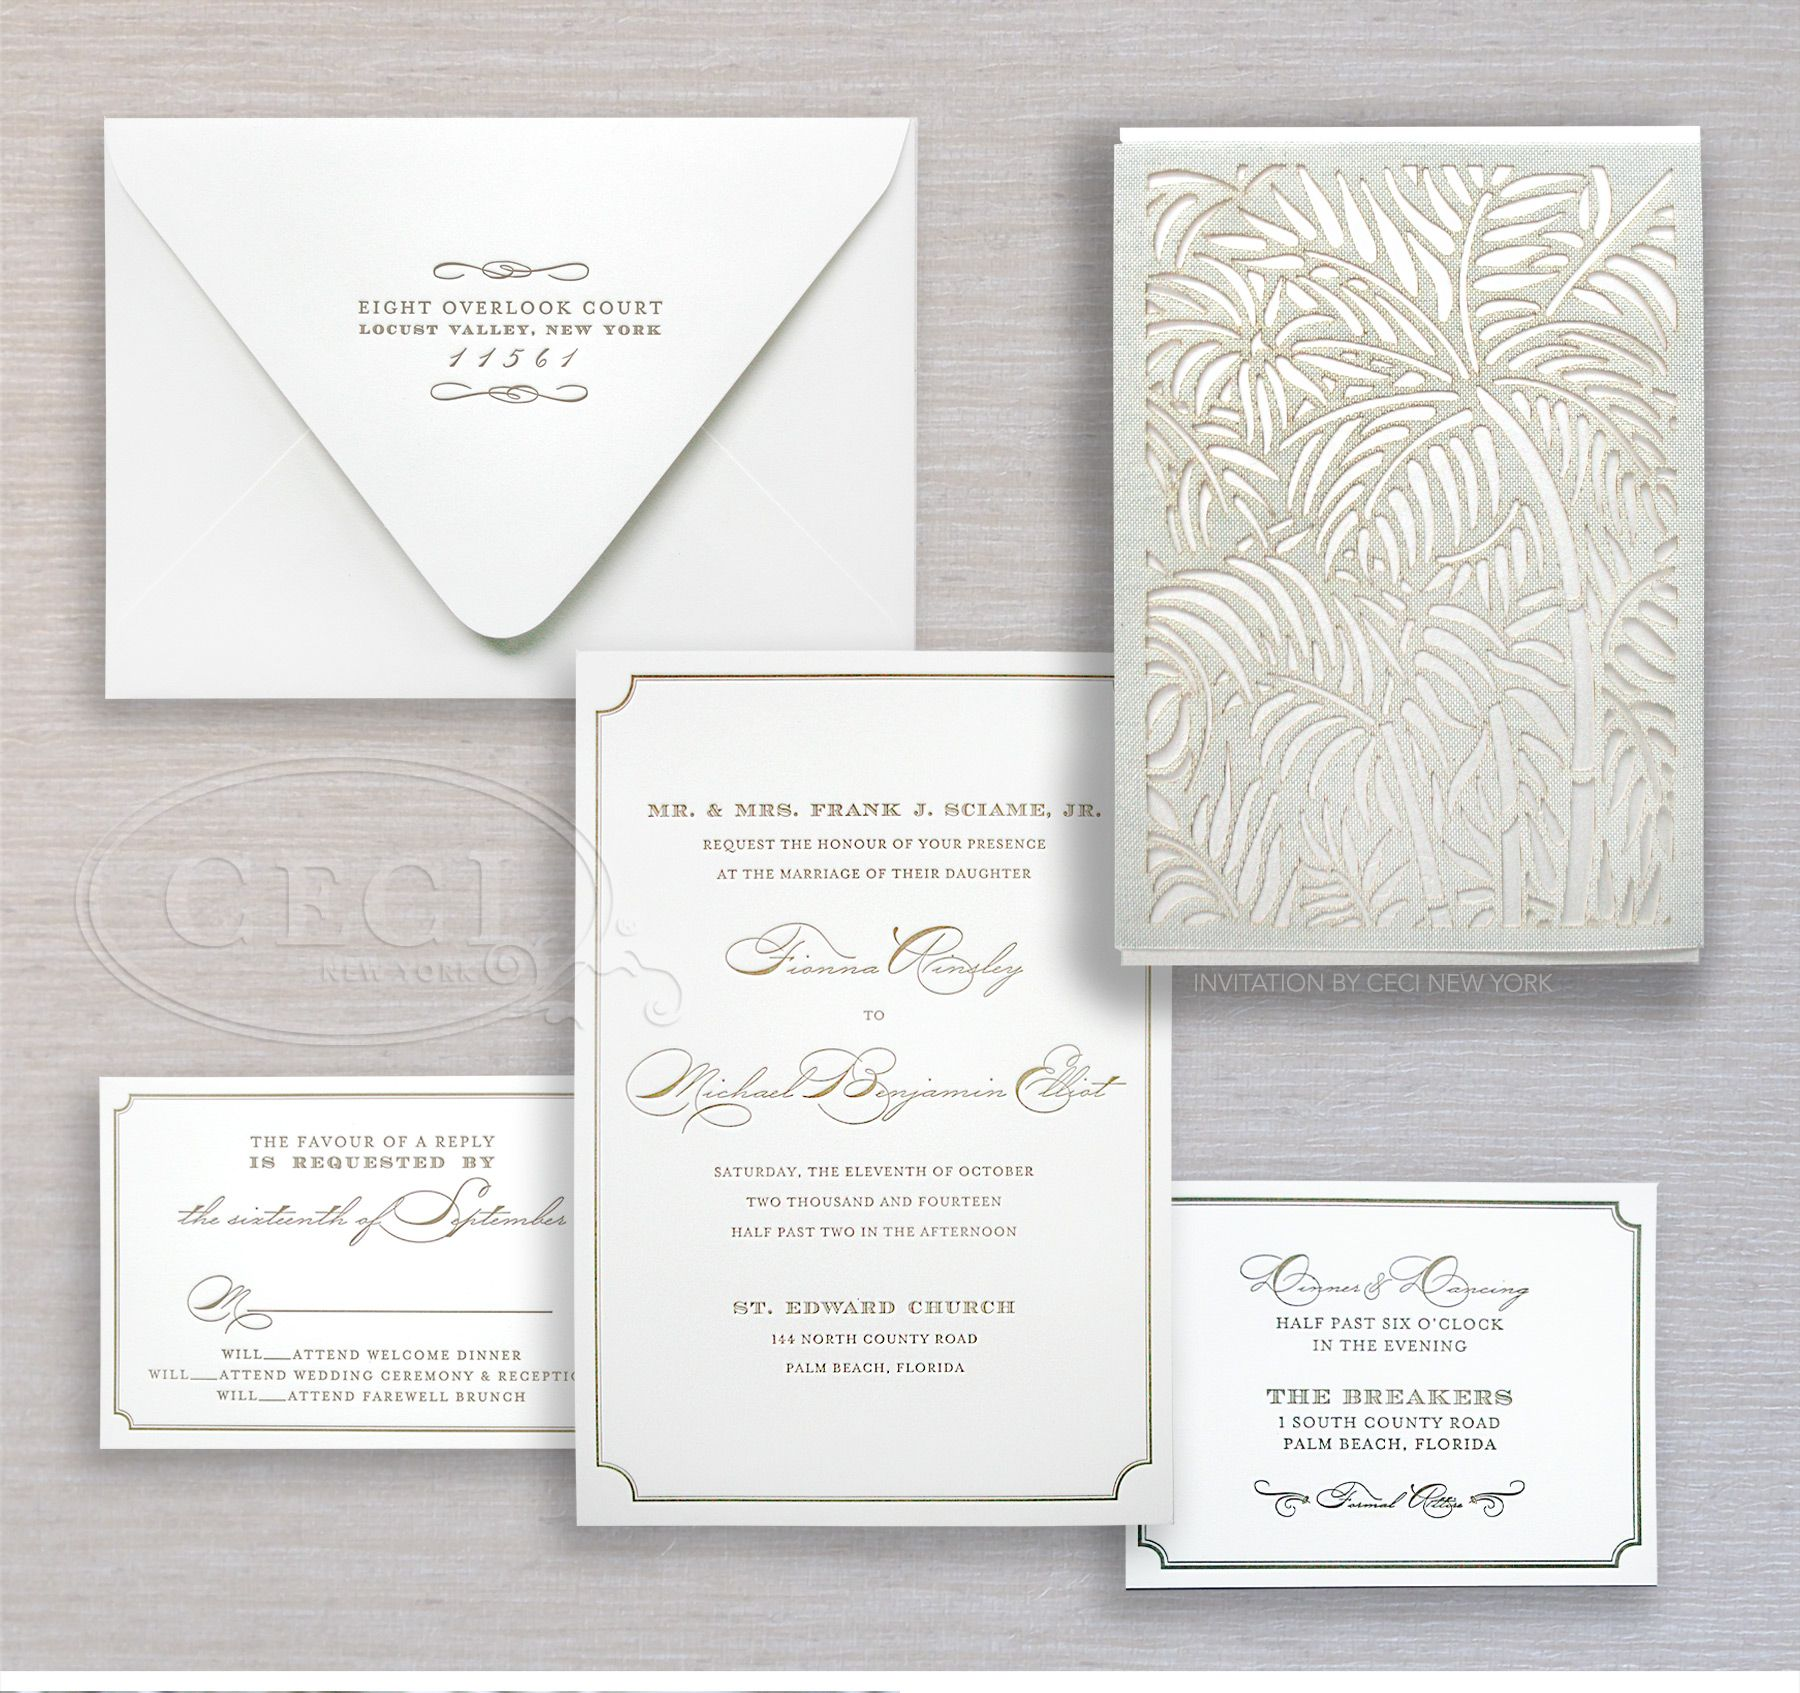 Luxury Wedding Invitations By Ceci New York: Luxury Wedding Invitations By Ceci New York